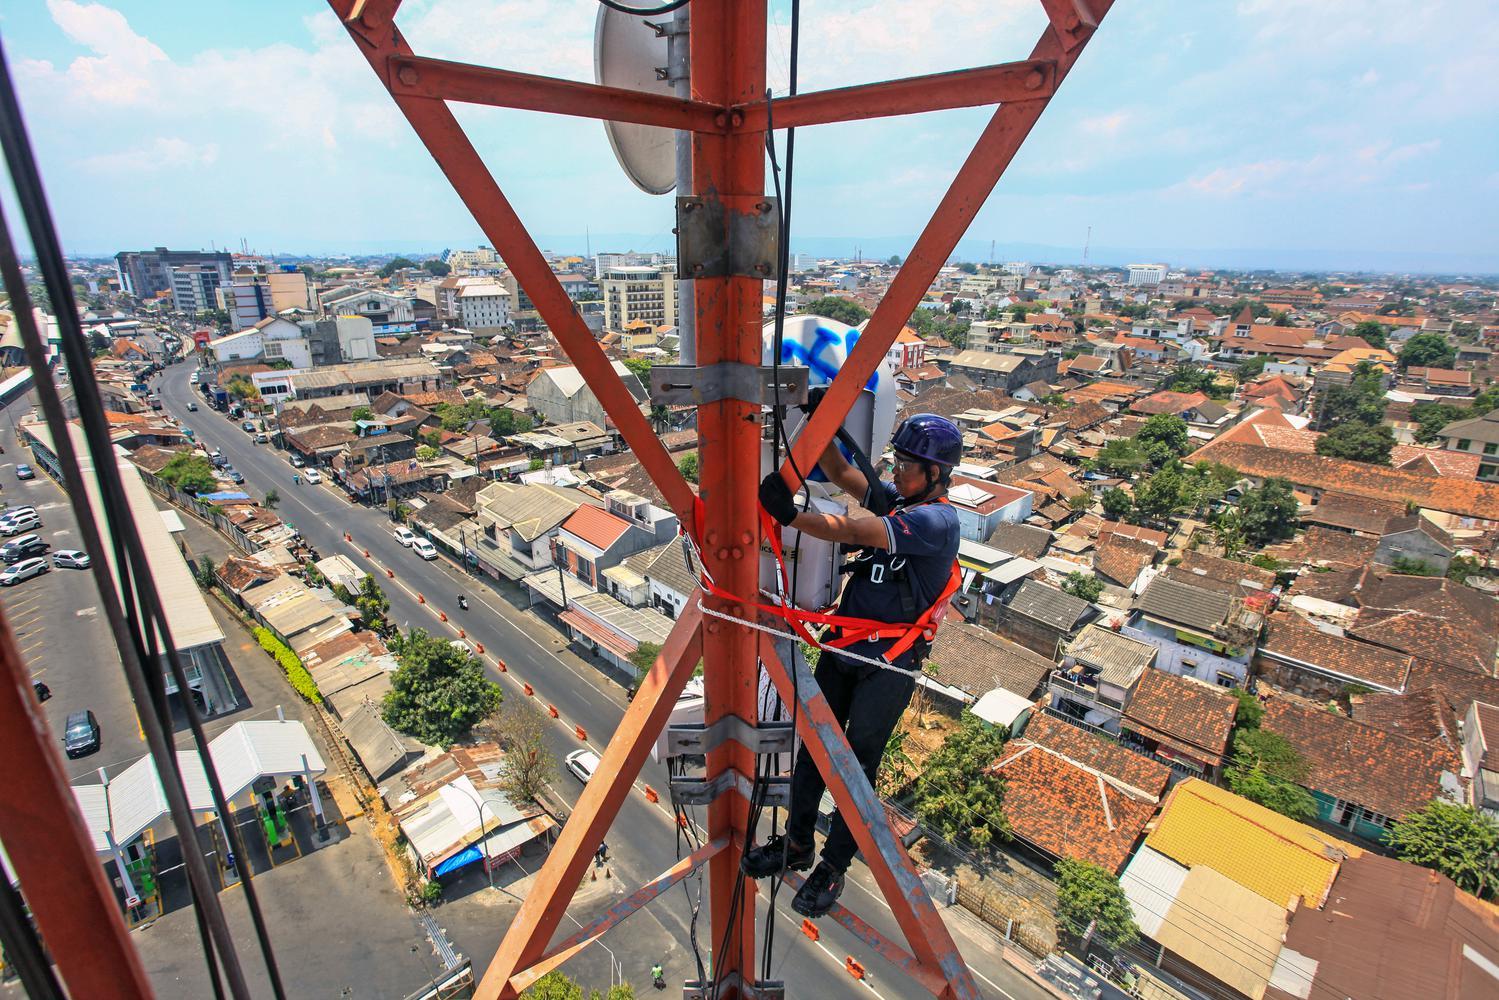 Teknisi melakukan pemeliharaan perangkat Base Transceiver Station (BTS) milik XL Axiata di menara yang berada di Pringgokusuman, Yogyakarta, Kamis (03/10/2019). Perawatan rutin tersebut guna menjamin kenyamanan pelanggan XL Axiata, dimana memasuki usia ke